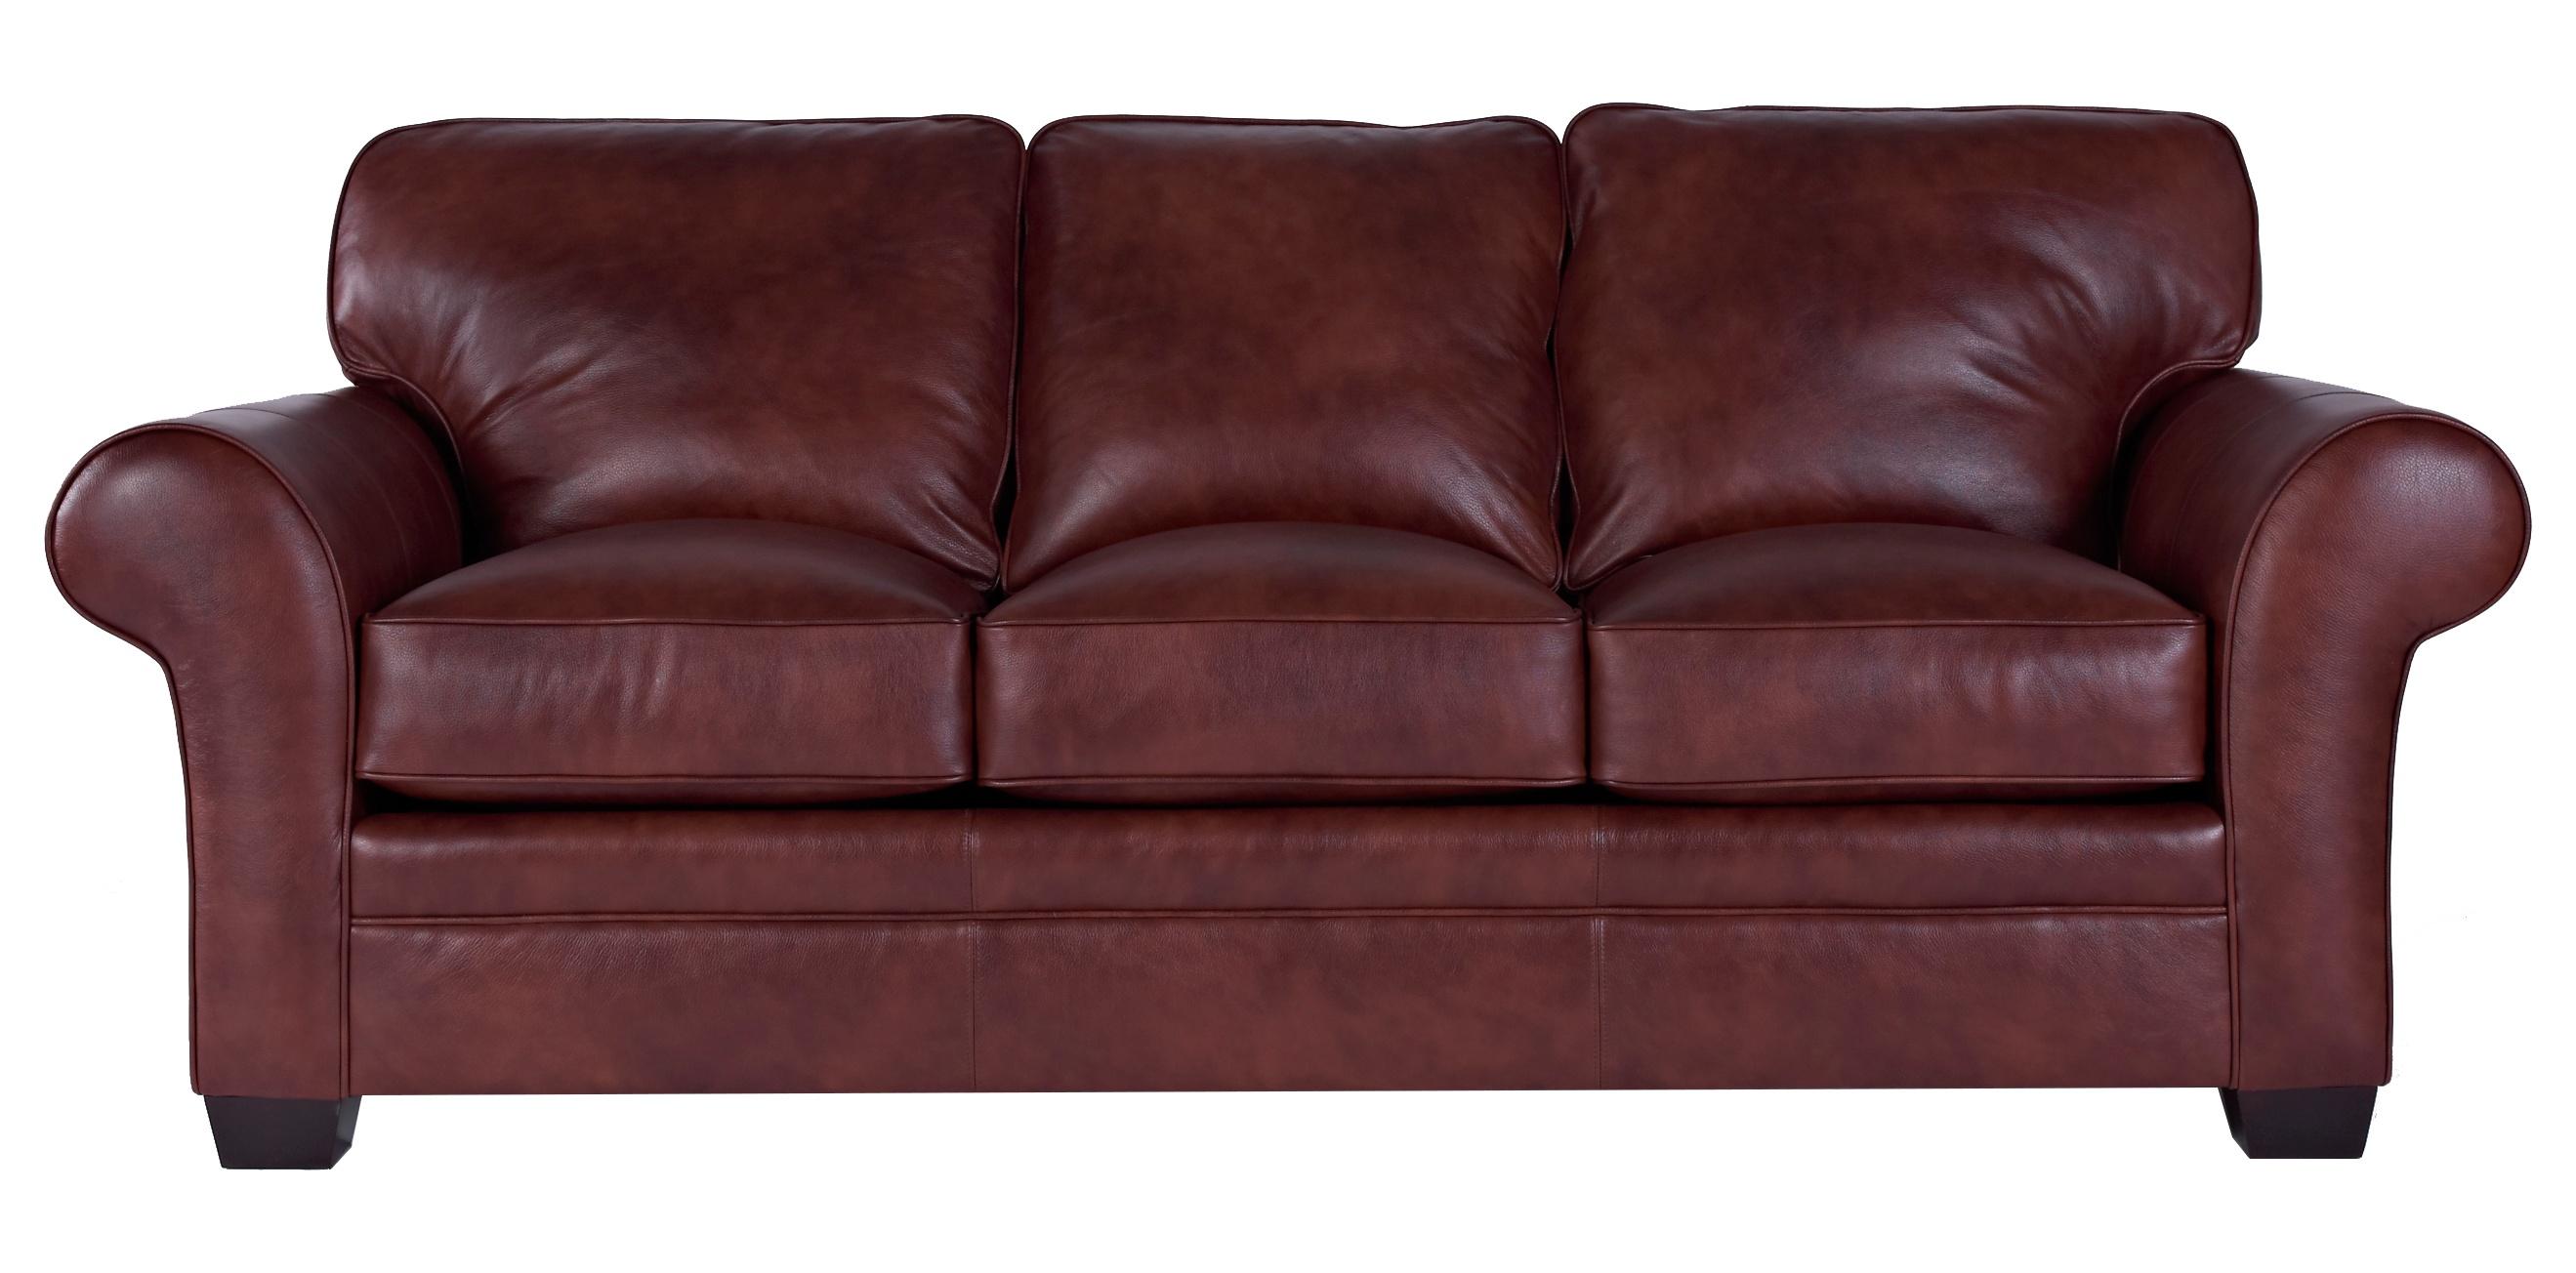 Marvelous Zachary 7902 Queen Sleeper Customize 350 Sofas And Lamtechconsult Wood Chair Design Ideas Lamtechconsultcom